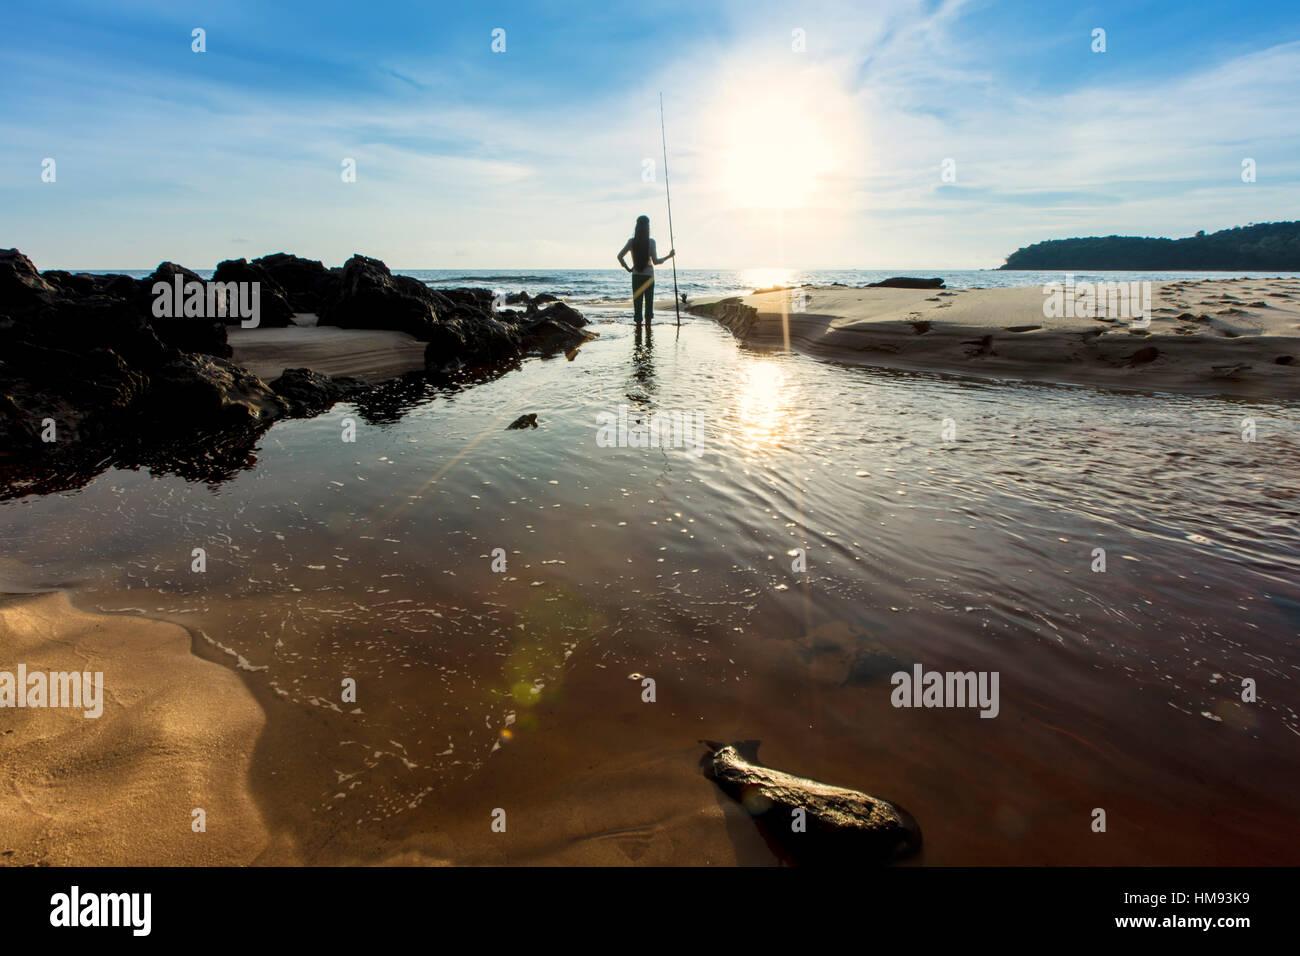 Vietnamese fisherwoman on an island beach near Sihanoukville, Cambodia, Indochina, Southeast Asia - Stock Image